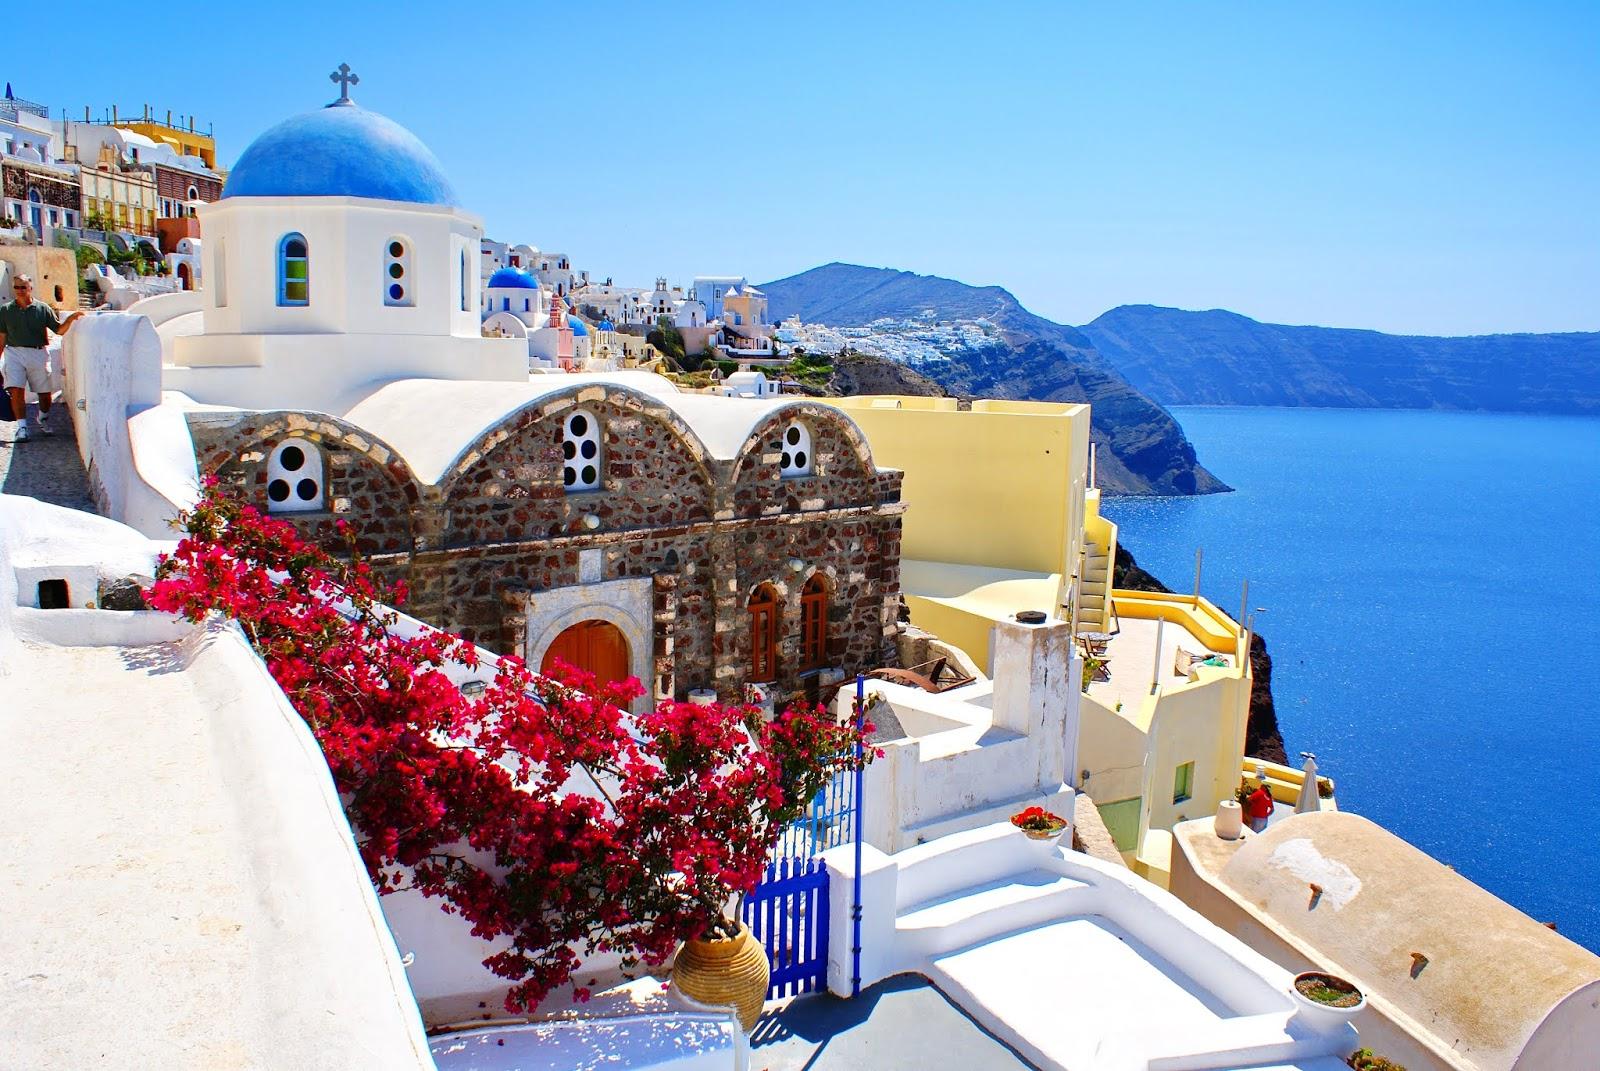 Beautiful And Amazing Architecture,Architecture Wallpapers,Wallpapers,خلفيات جميلة ومدهشة العمارة,خلفيات بناء,خلفيات,خلفيات عمارات,خلفيات أبنية